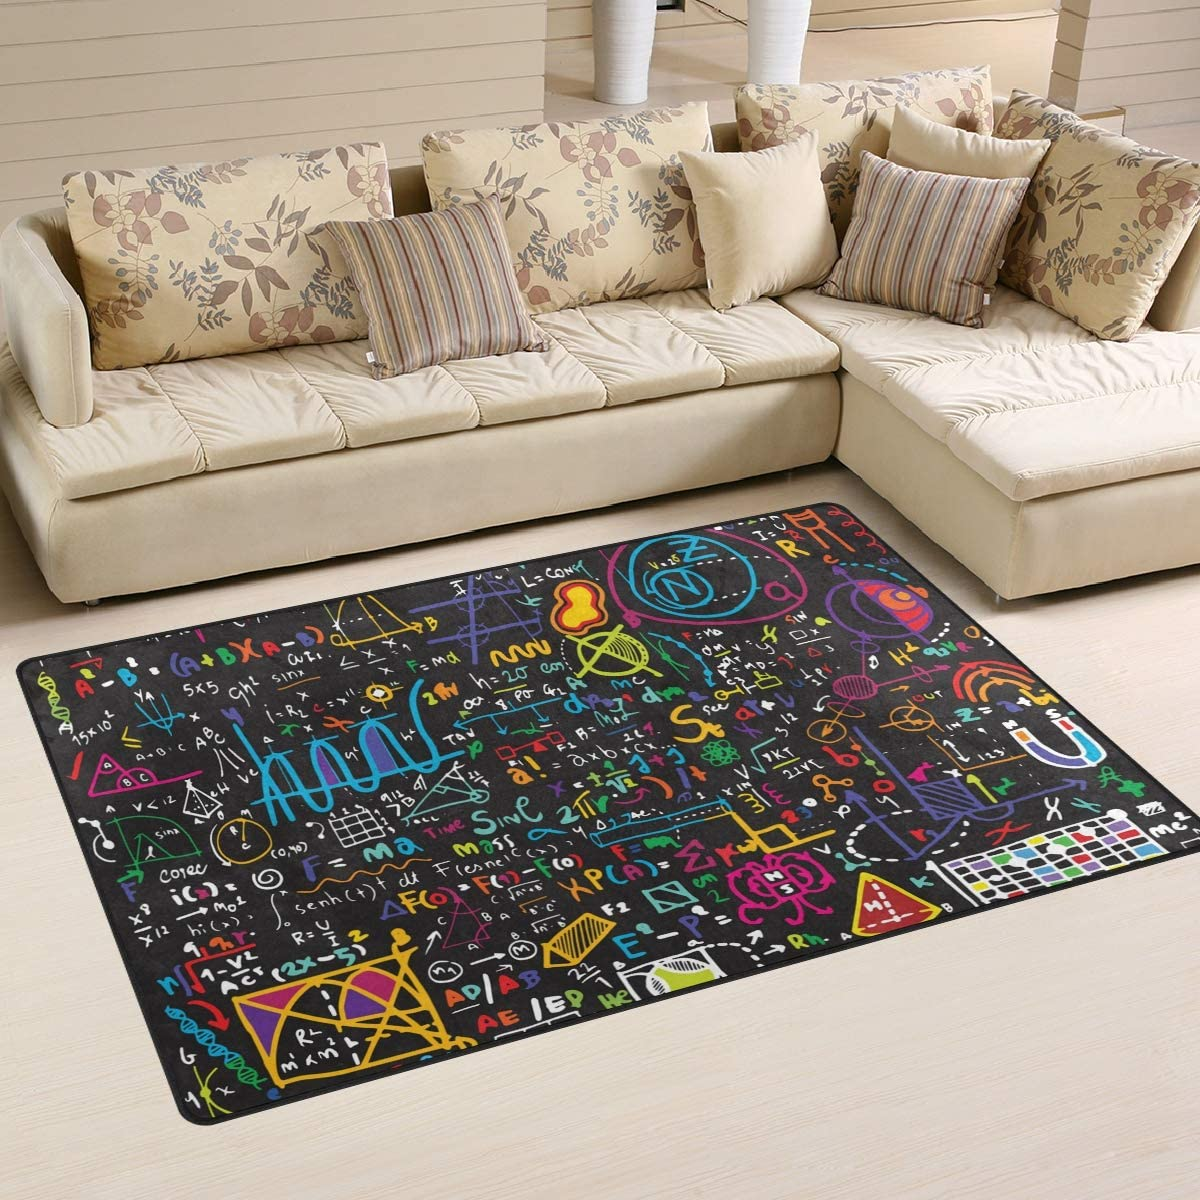 ALAZA Children Area Rug,Colorful Math Formula Floor Rug Non-Slip Doormat for Living Dining Dorm Room Bedroom Decor 60x39 Inch